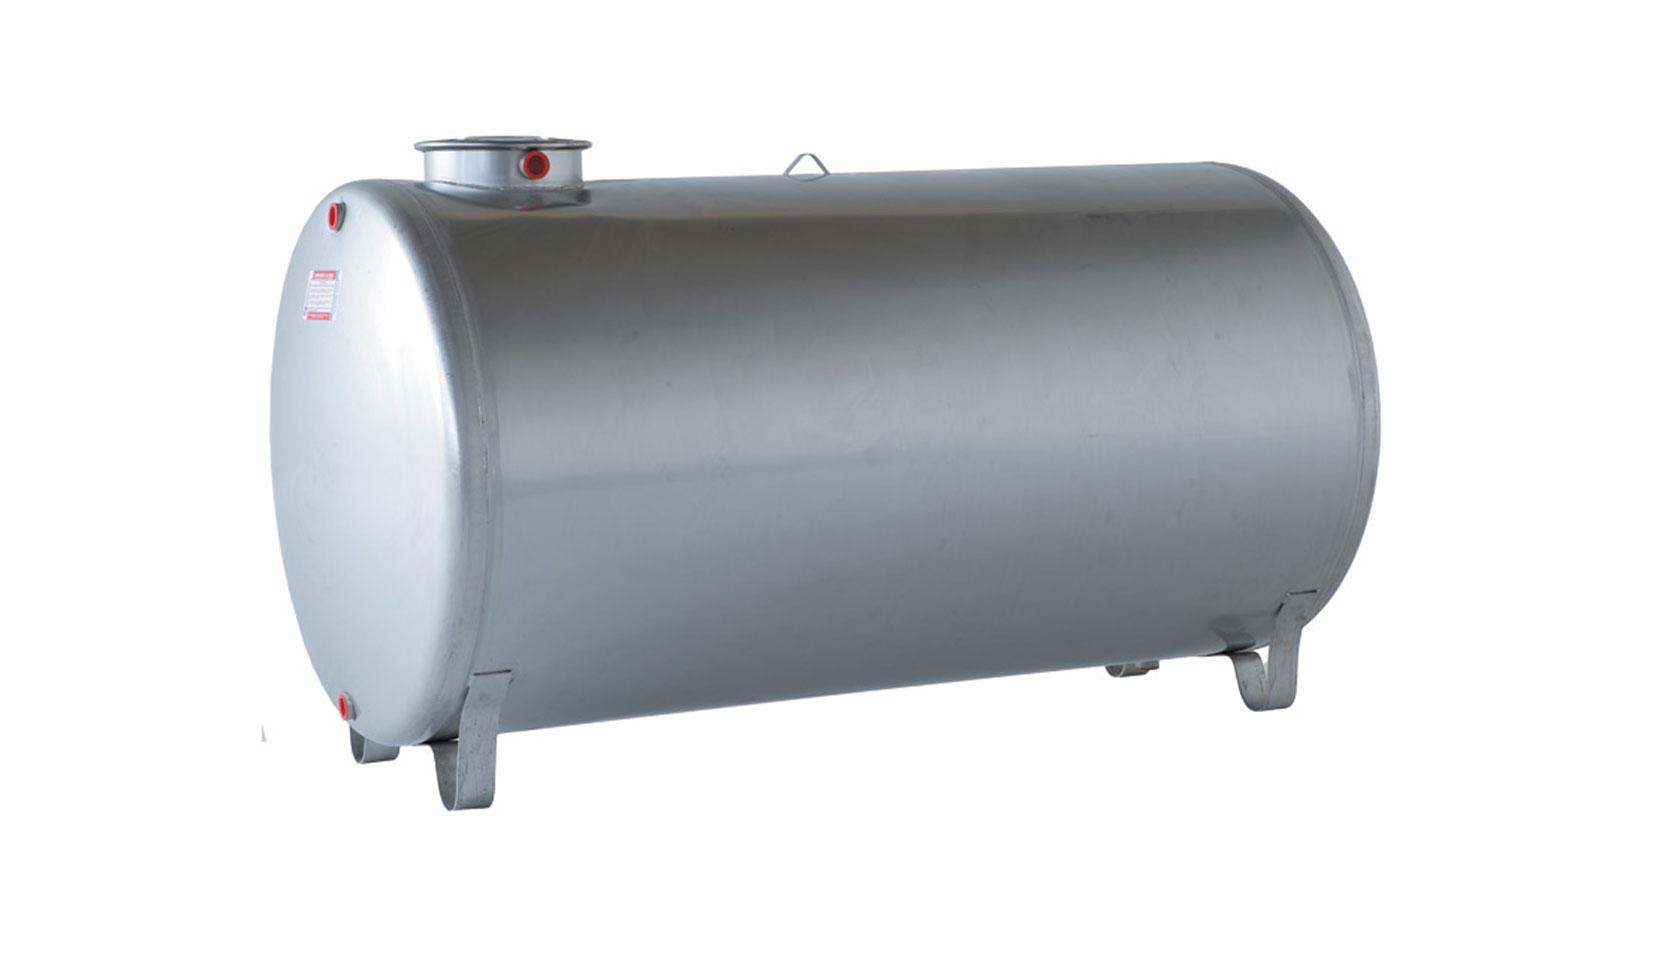 Serbatoio acciaio inox 300 litri orizzontale aisi 304 for Peso lamiera acciaio inox aisi 304